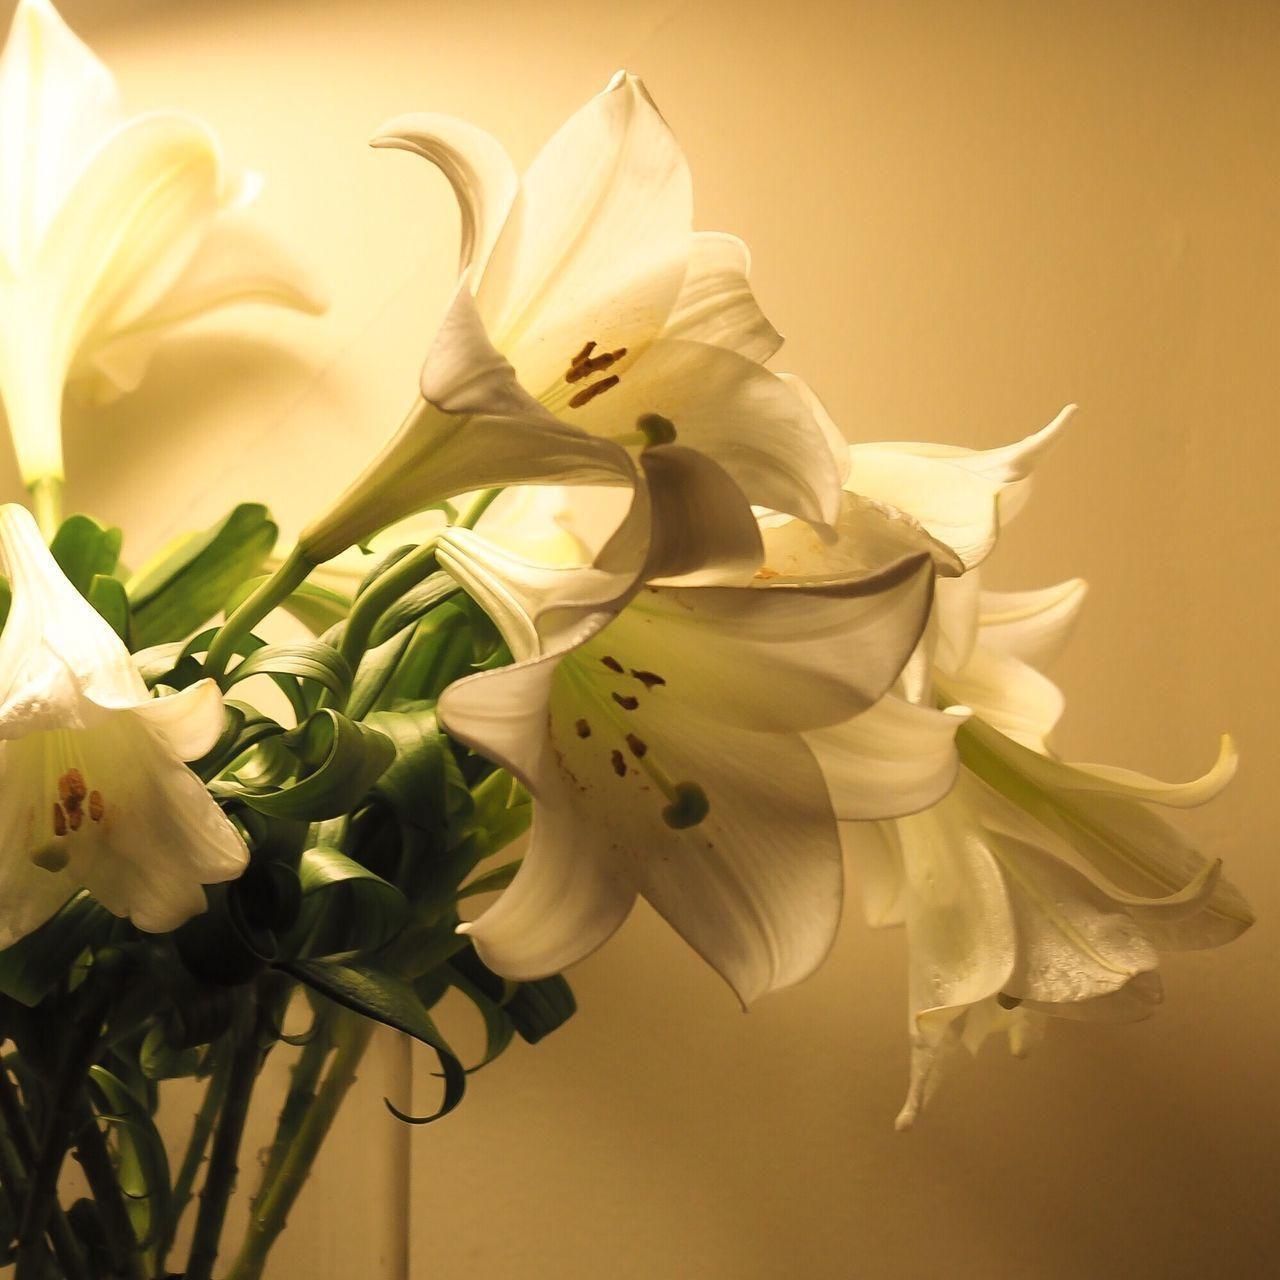 Lilies In Bloom White Lilies Flowers Cut Flowers Warm Indoors  Peaceful